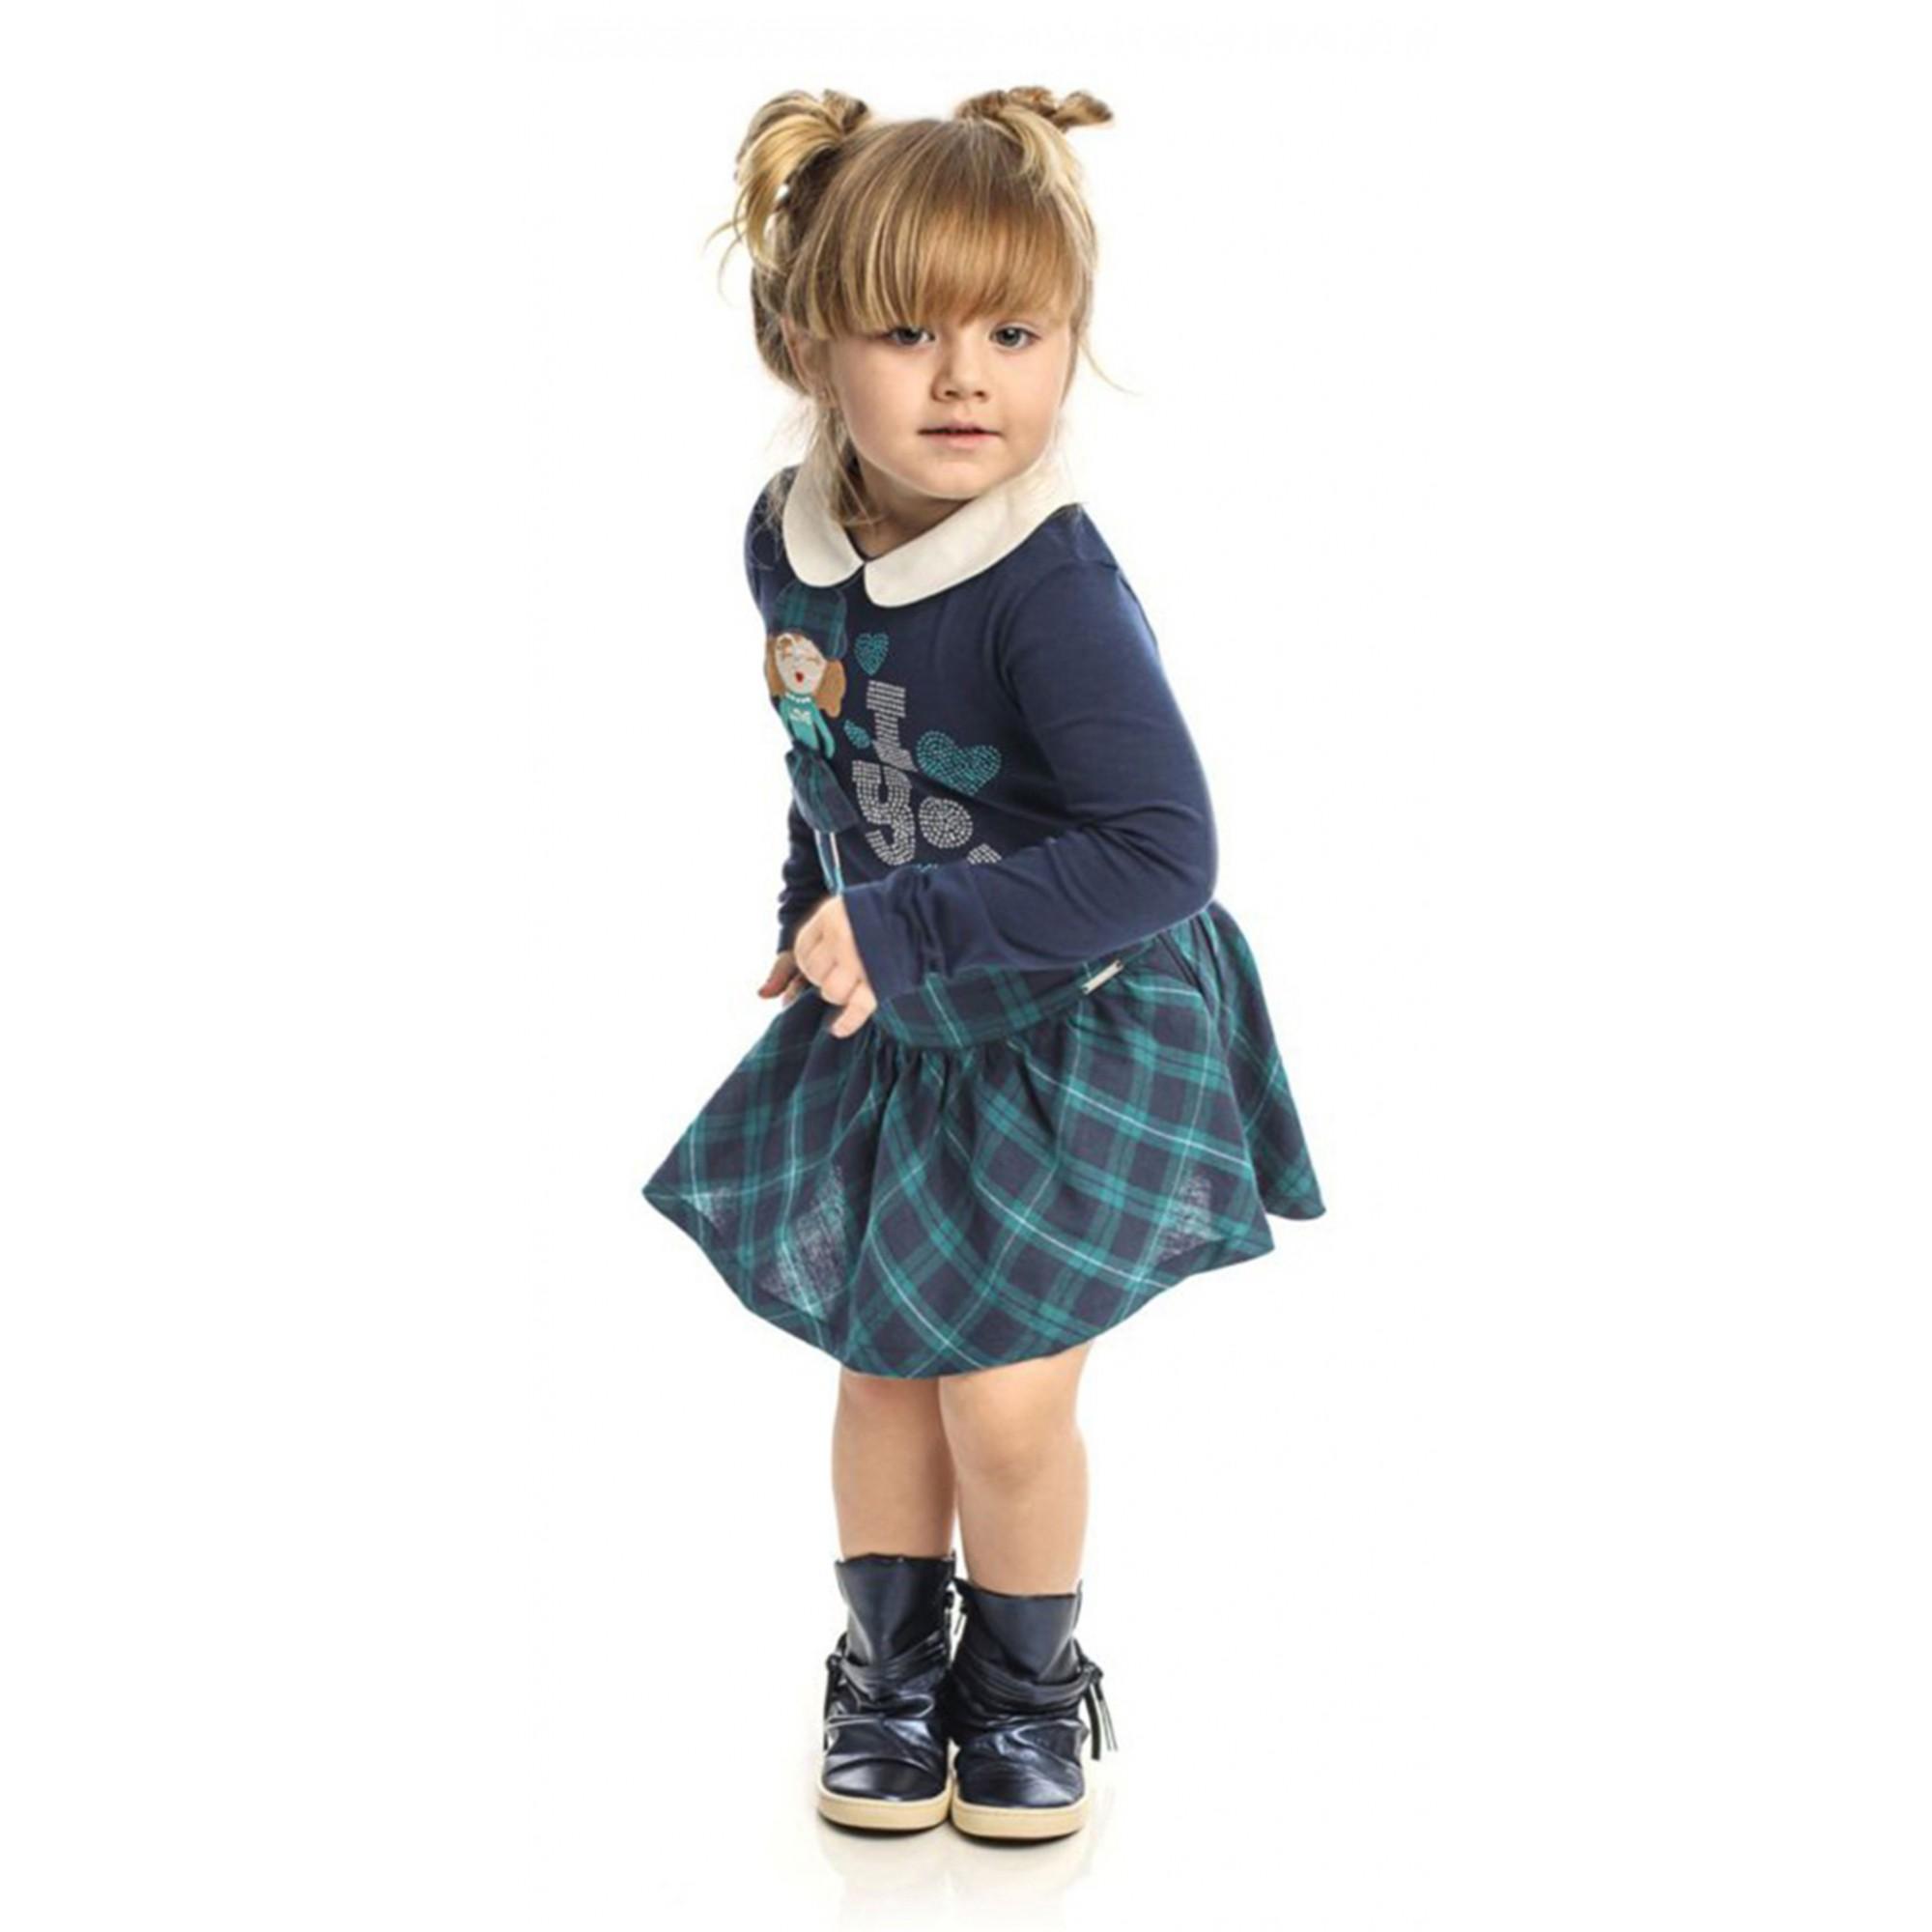 Conjunto Feminino Infantil Blusa Azul + Saia Xadrez Matinée